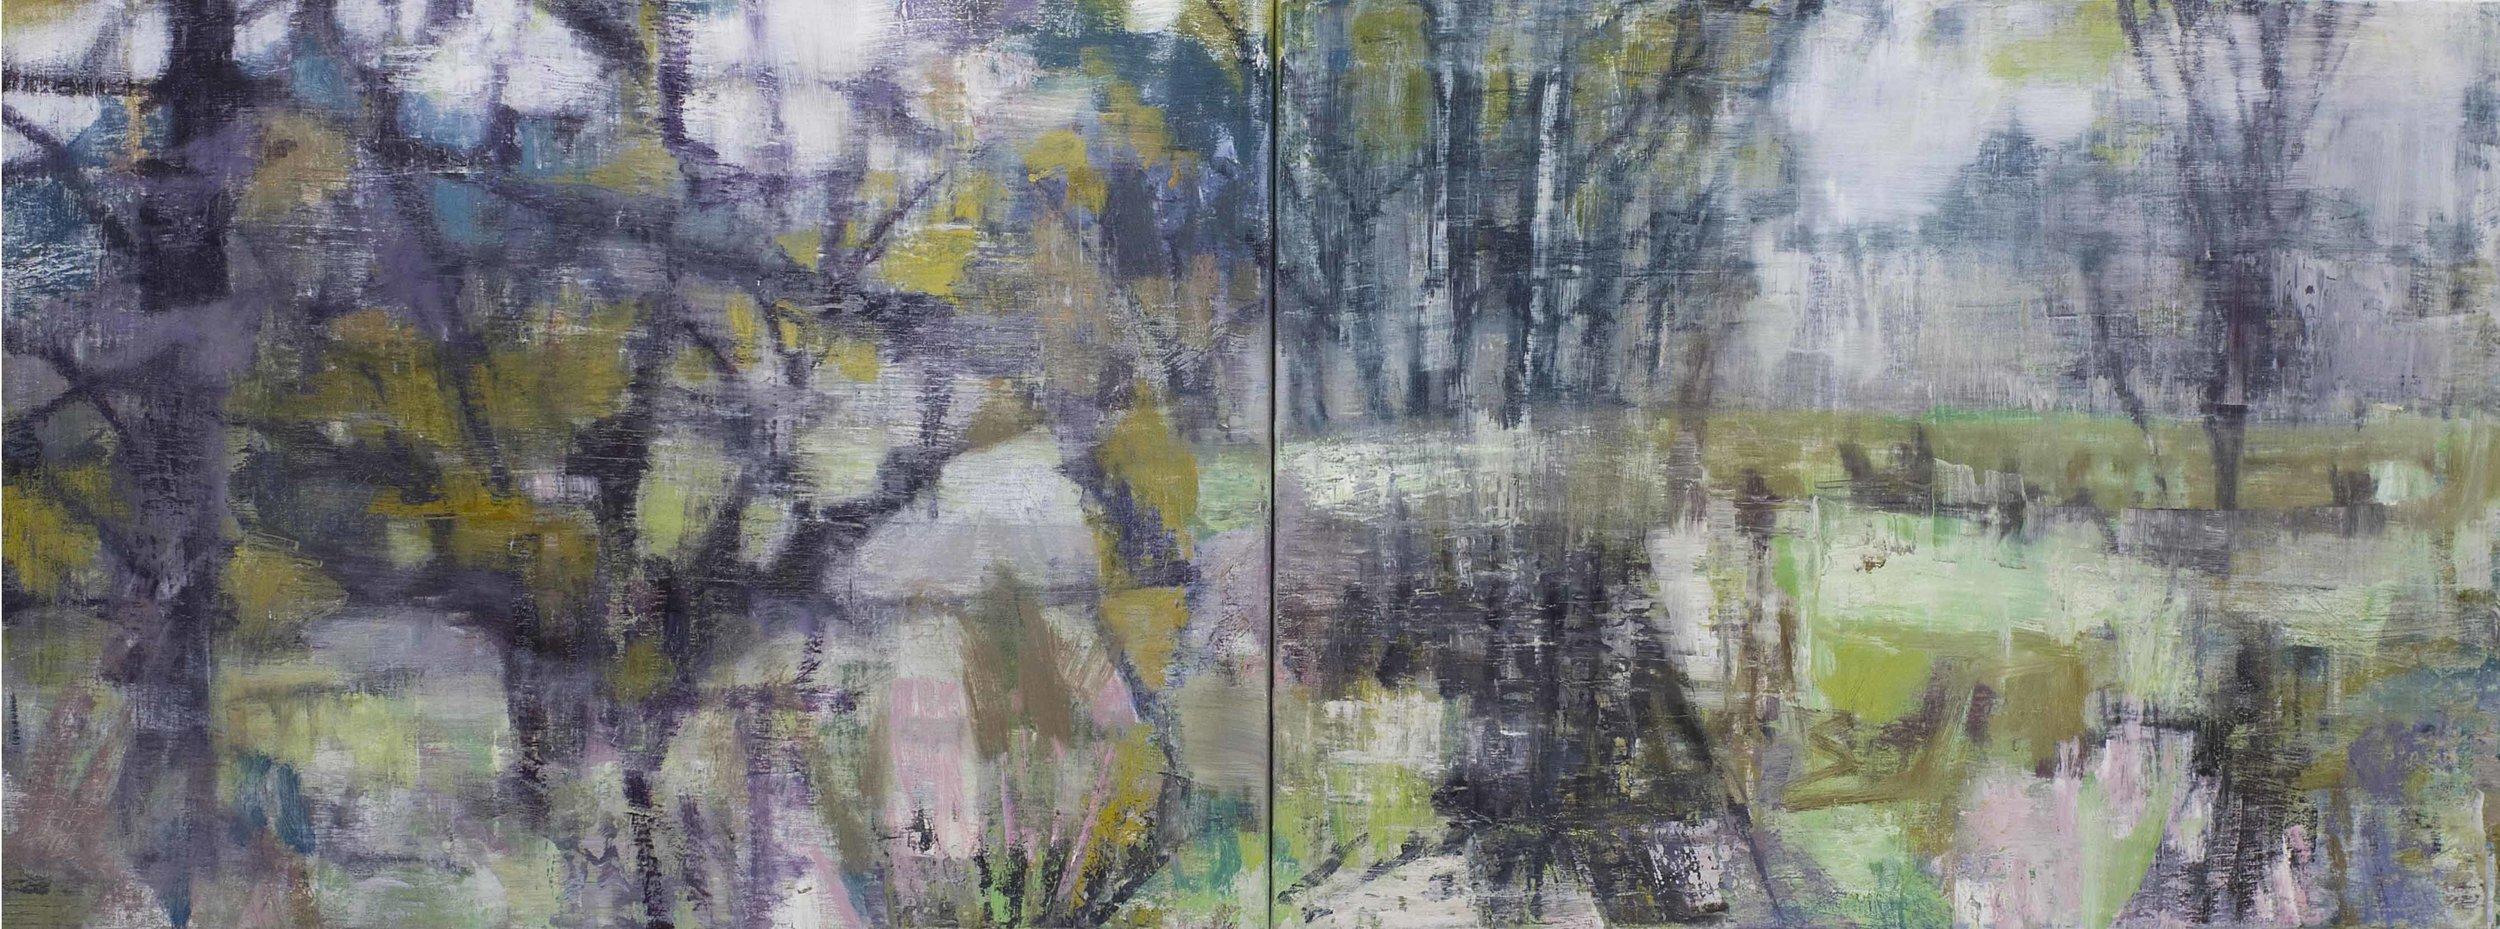 Joanna Logue, Willow - Ducknest Paddock II , 2016, oil on linen, 60 x 160cm